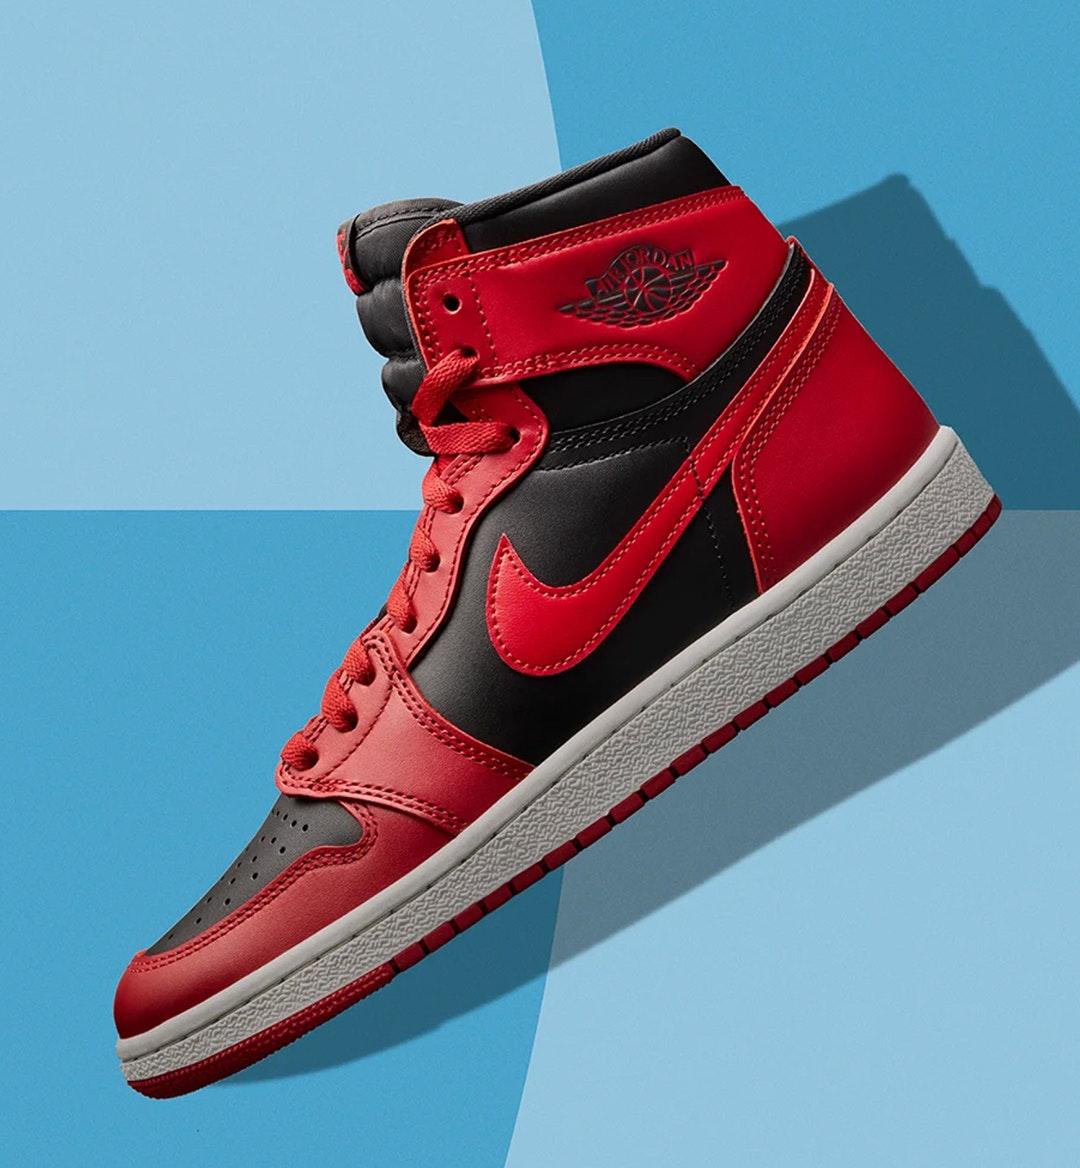 shoe drops this week